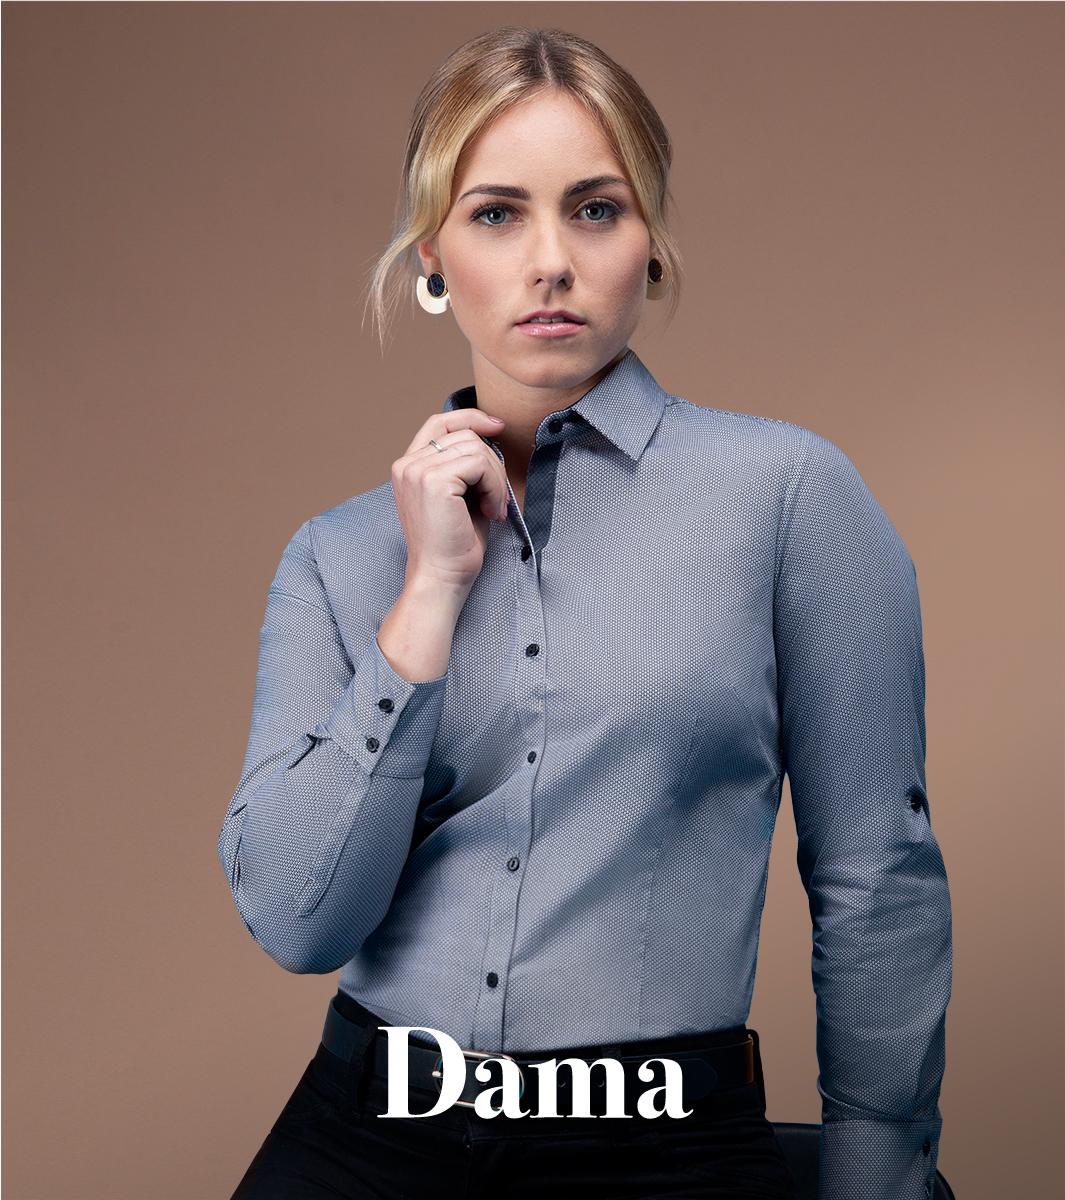 dama 2020 2